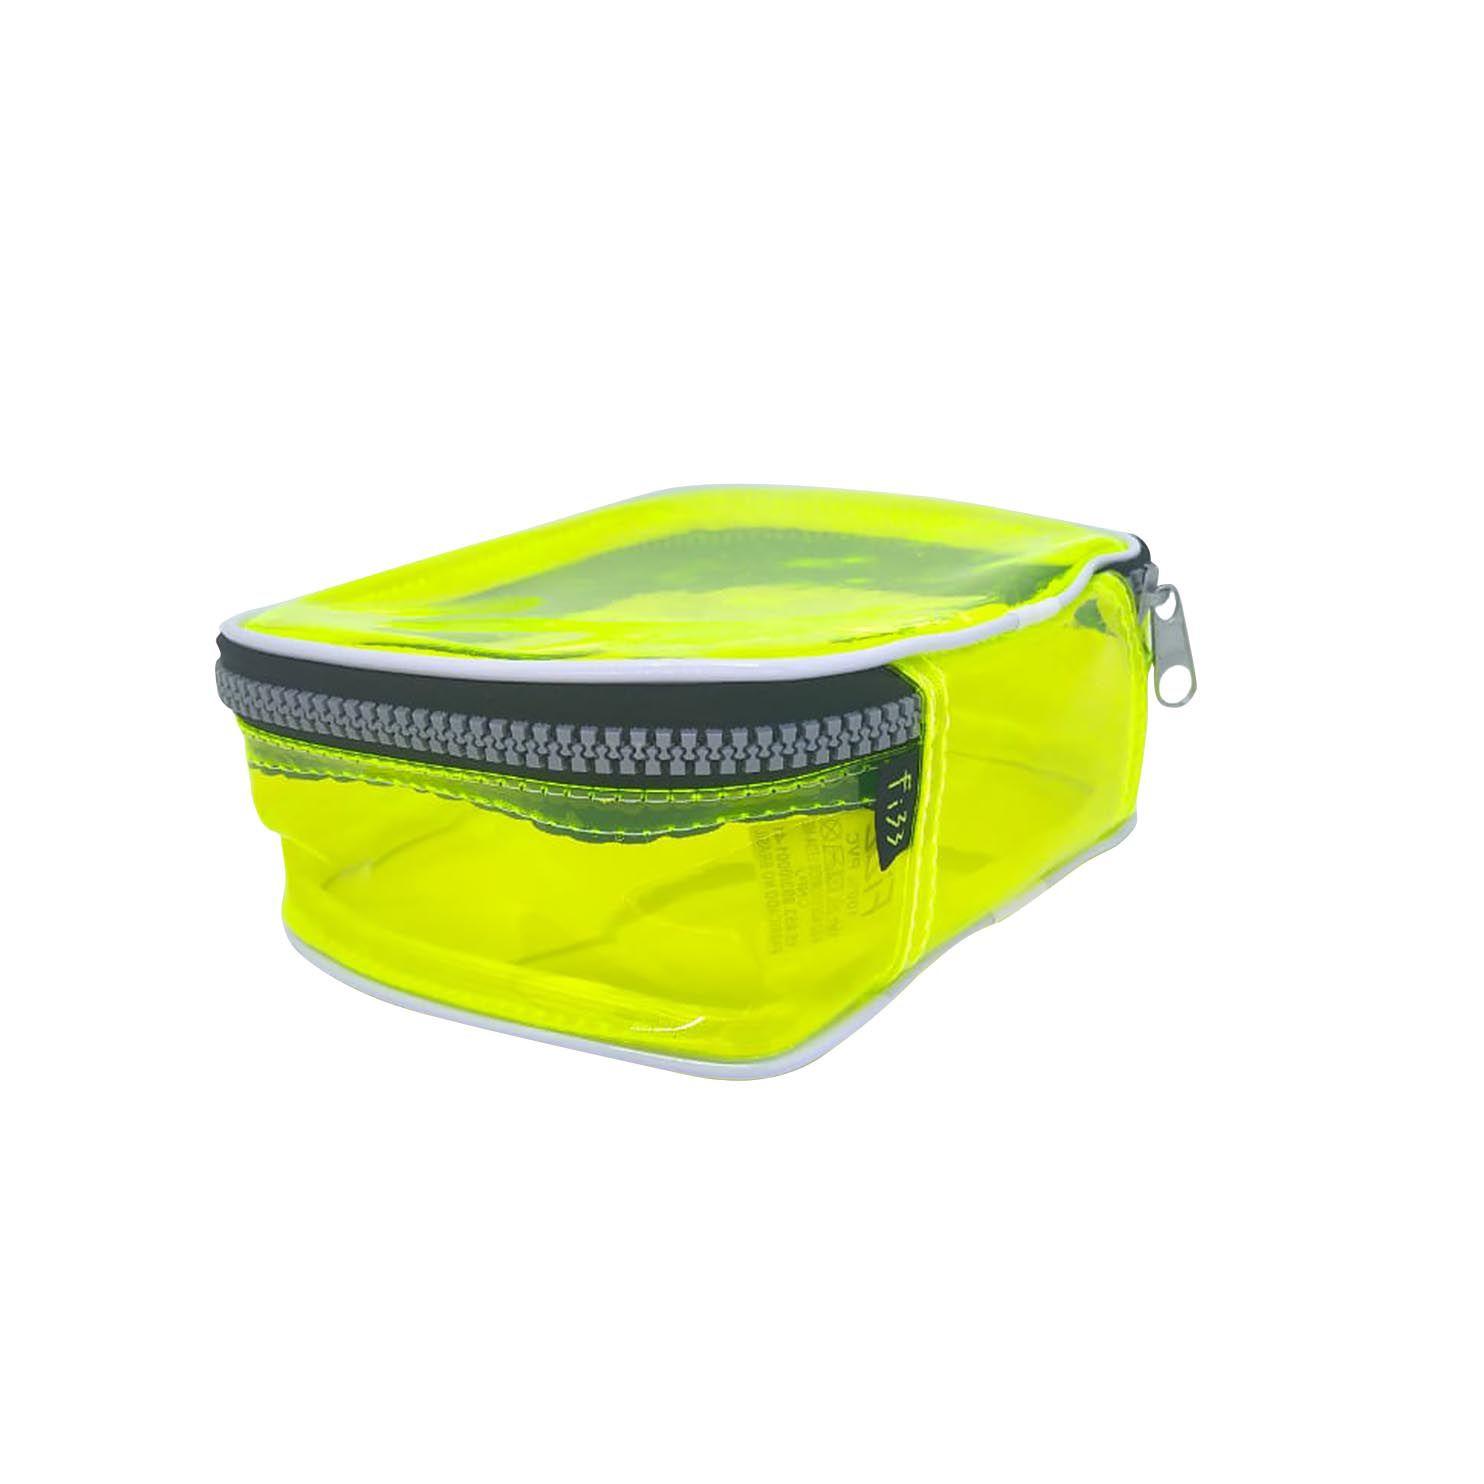 Estojo escolar box amarelo neon transparente Fizz